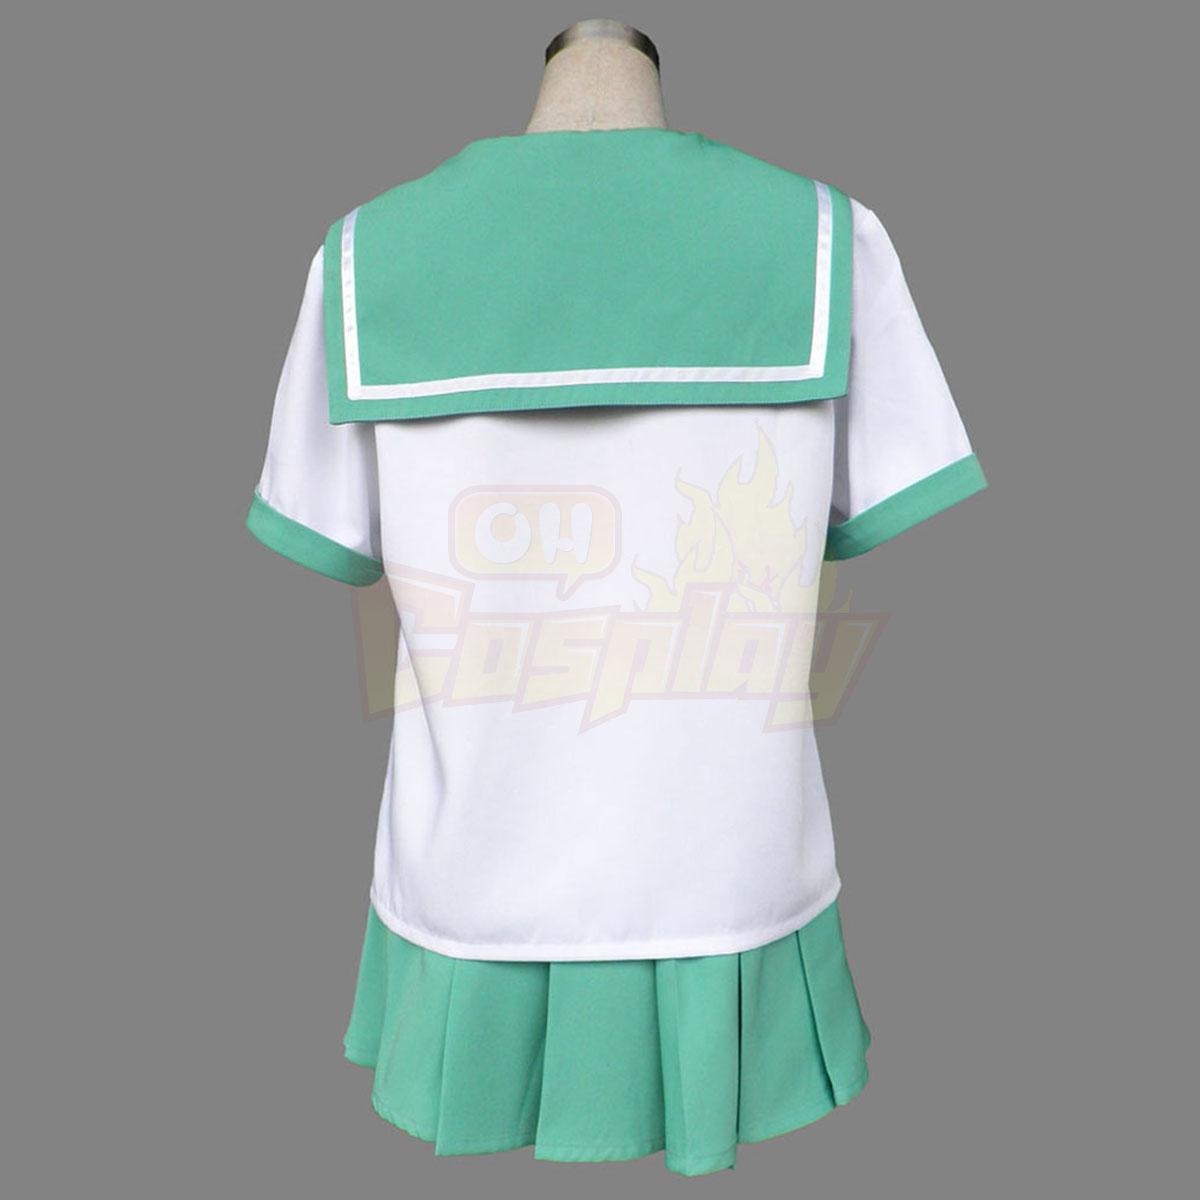 Luksuriøs The Prince of Tennis Youth Academy Sommer School Uniformer udklædning Fastelavn Kostumer